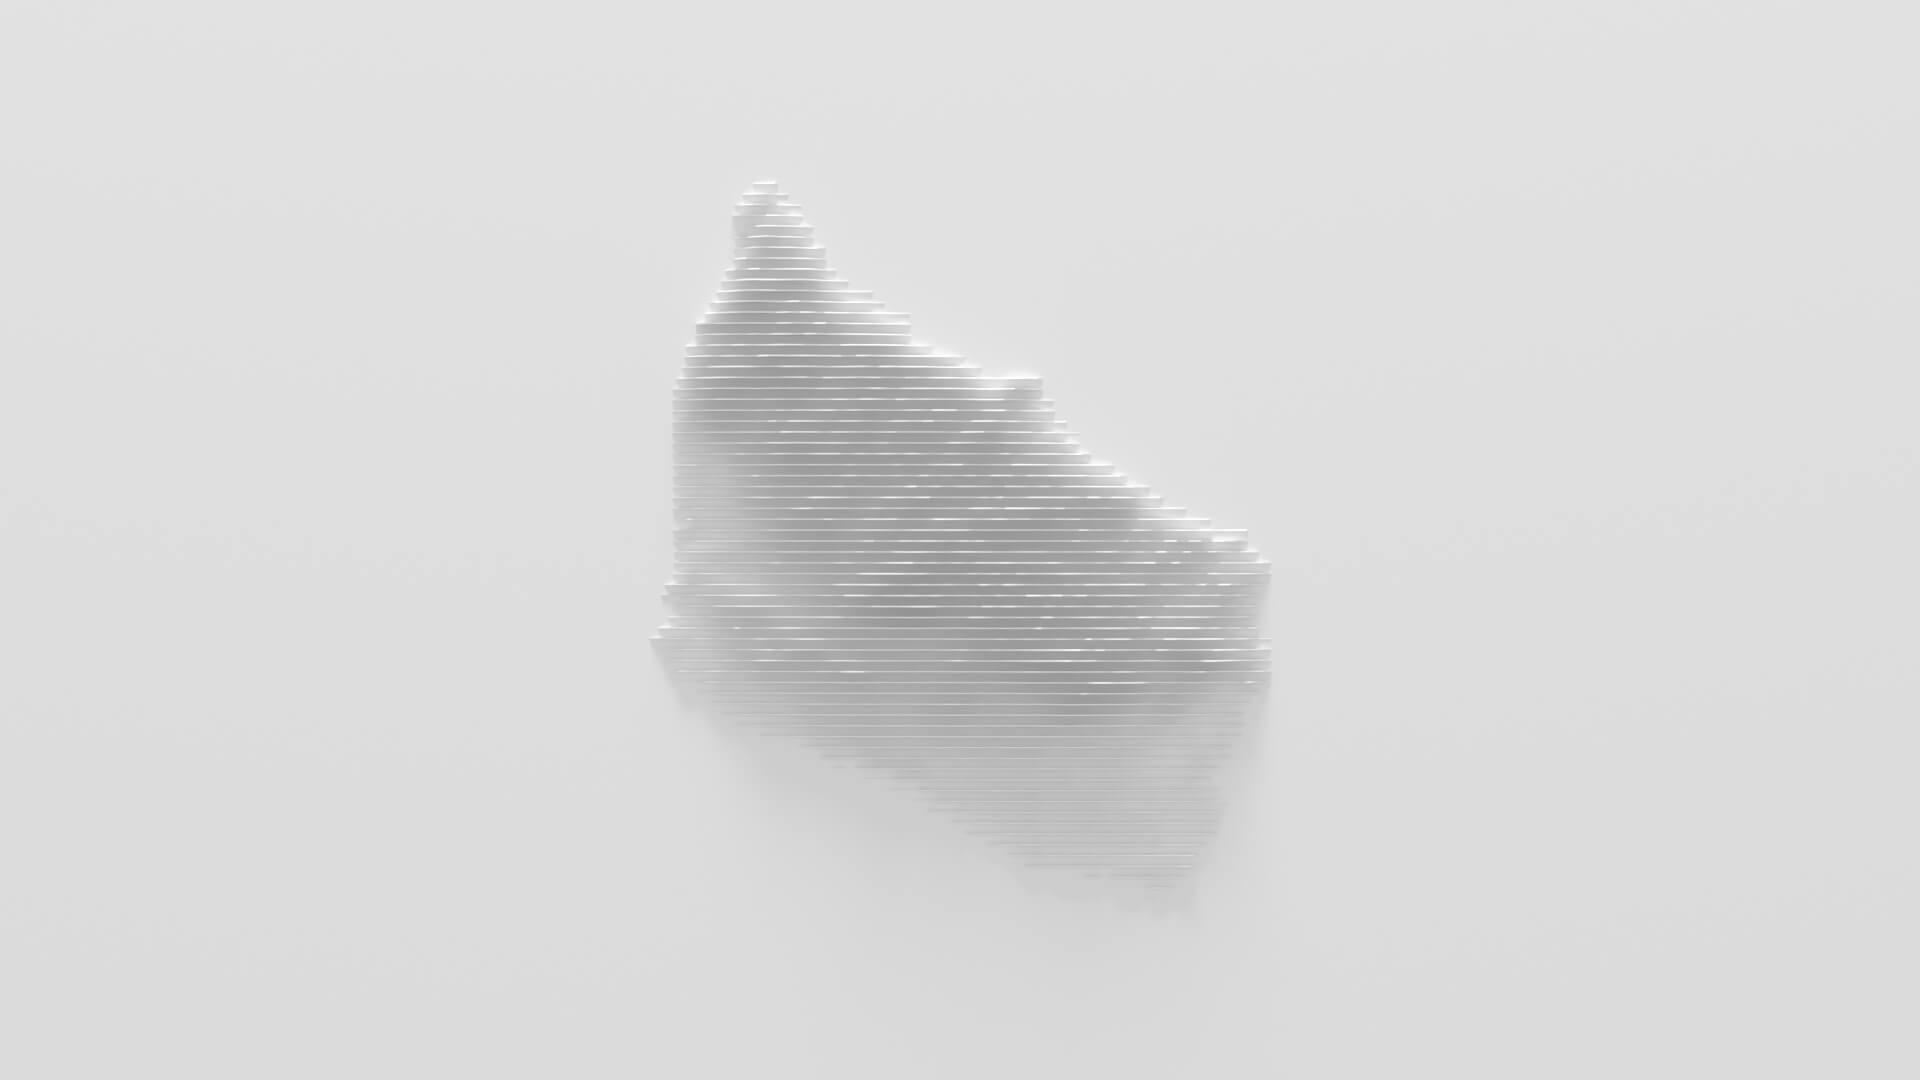 01 Vodka Bornholm Video Commercial 3D Product Island